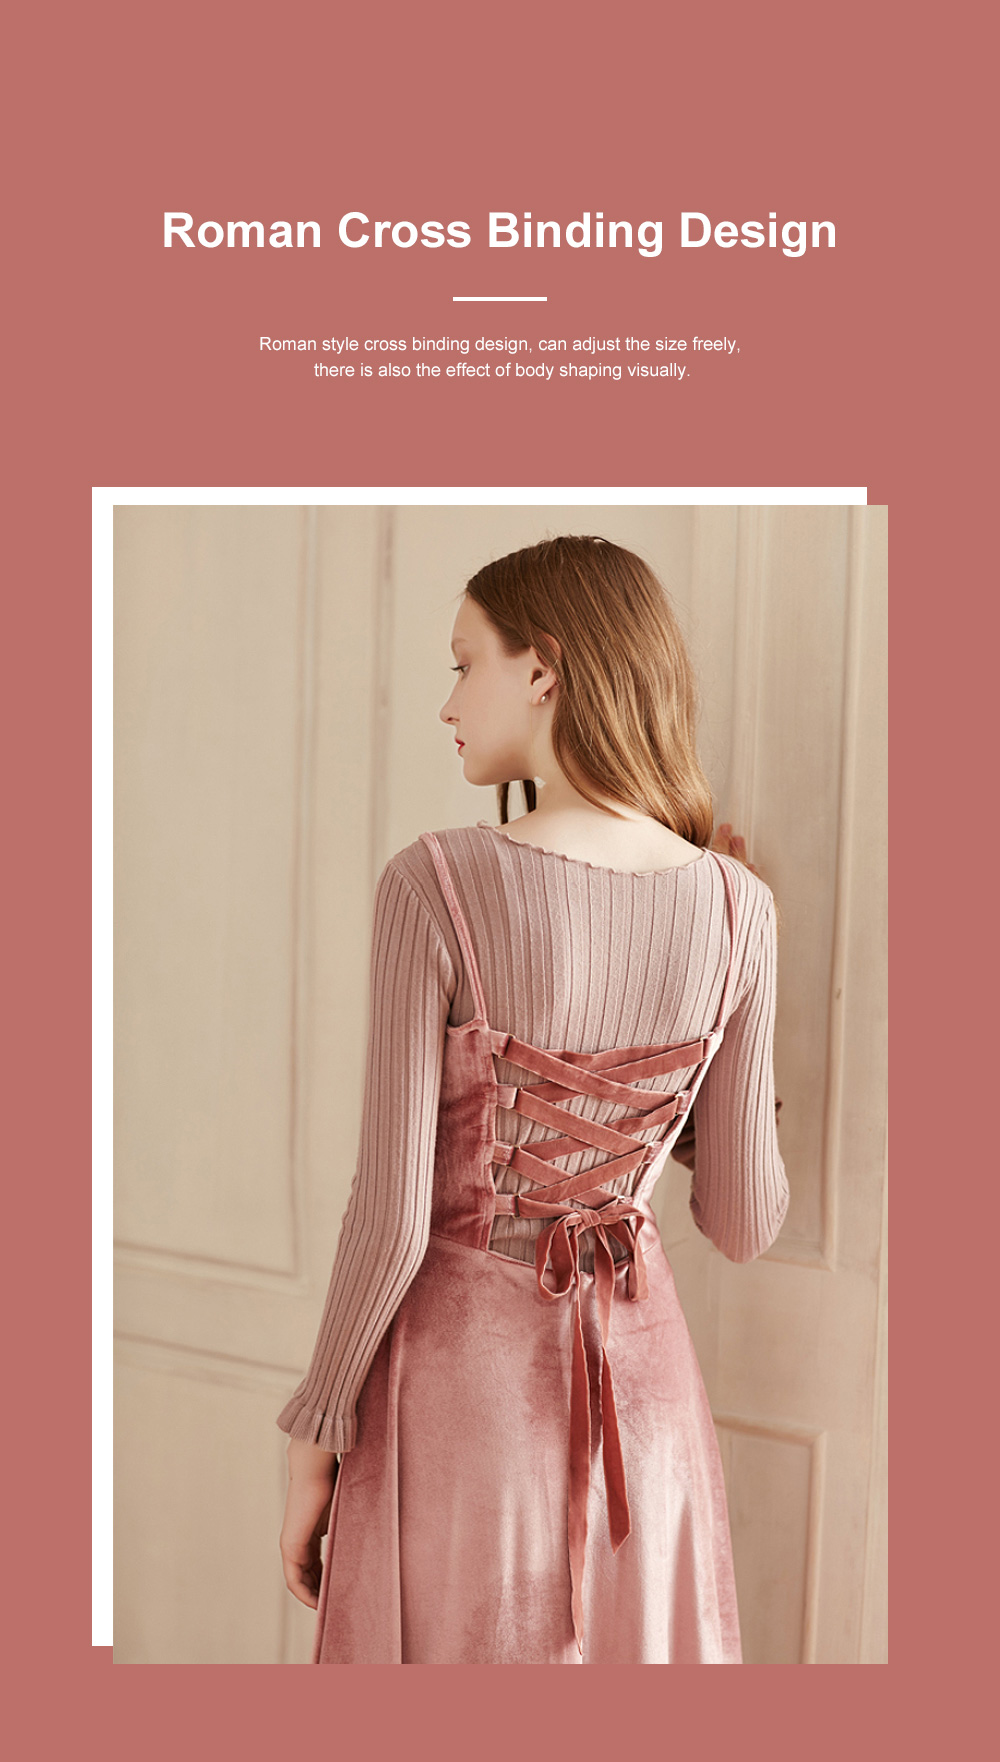 Women's Overall Suspender Dress Velvet Classic Retro Style with High Waist and Back Strap Ankle Length Bottoming Vest Skirt 2